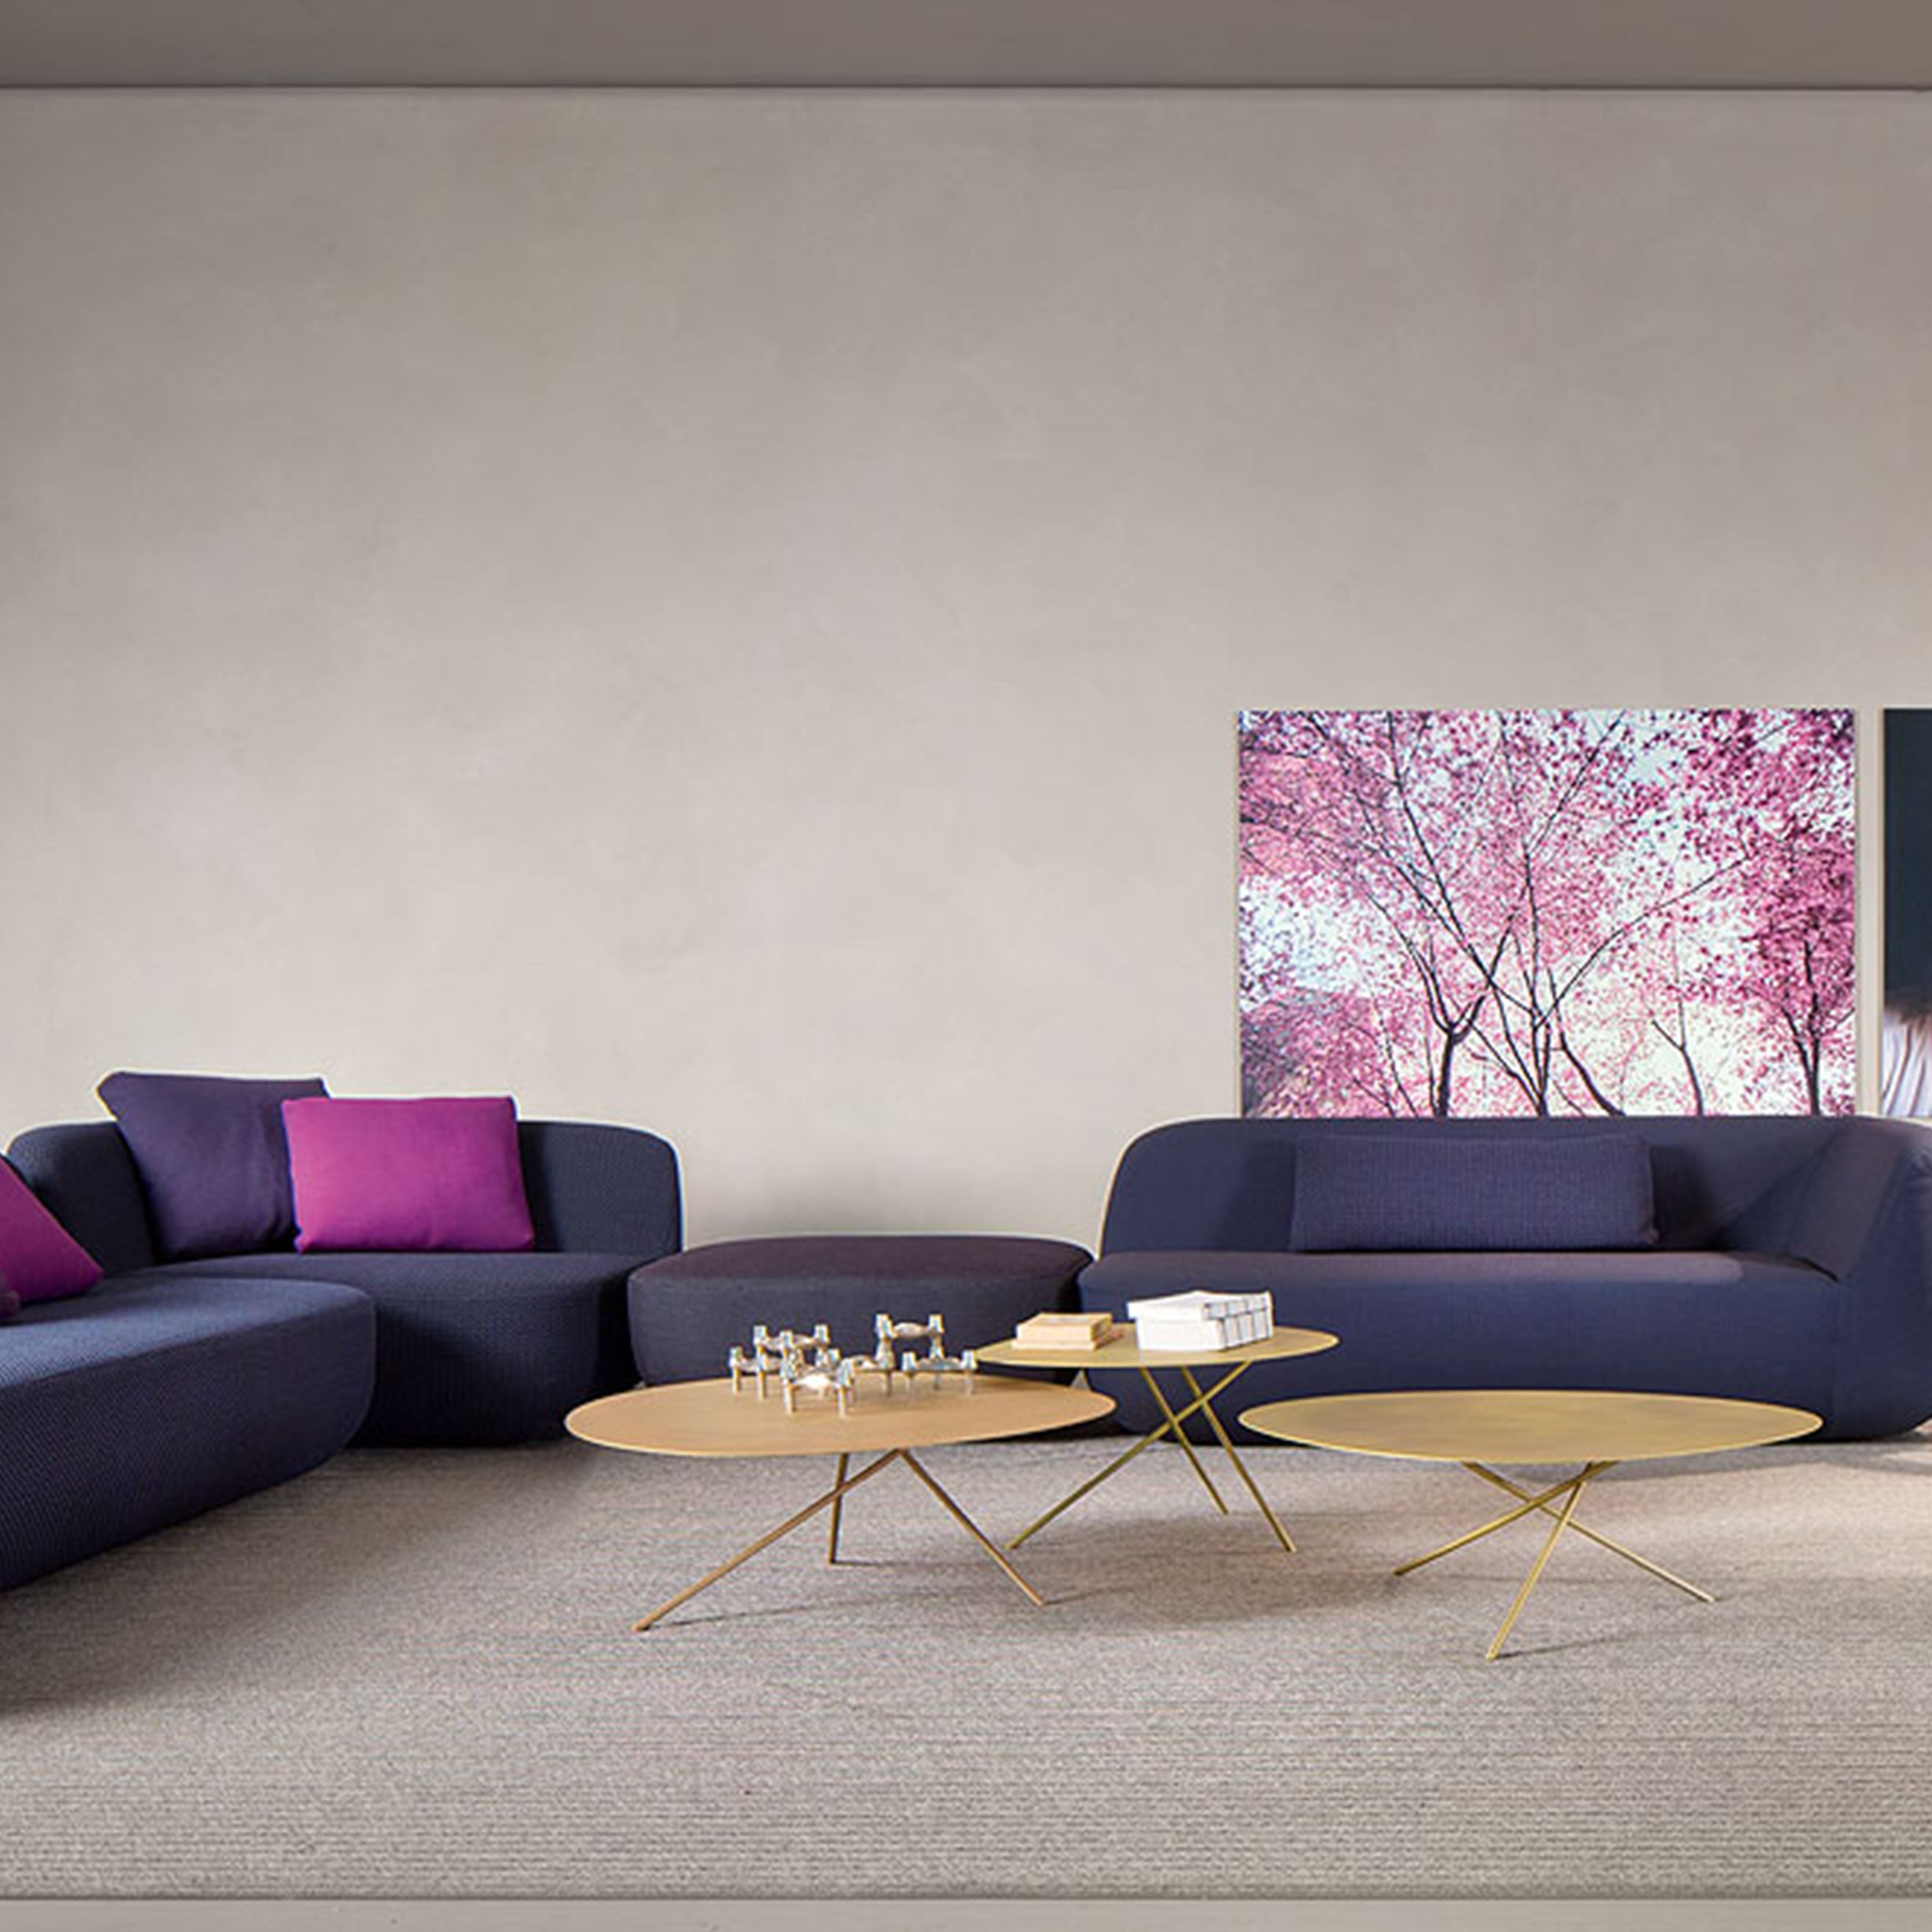 Luxury Italian Furniture Brands In India Vivono Brings Luxury Italian Furniture Brands Includes Ri Luxury Italian Furniture Italian Furniture Brands Furniture